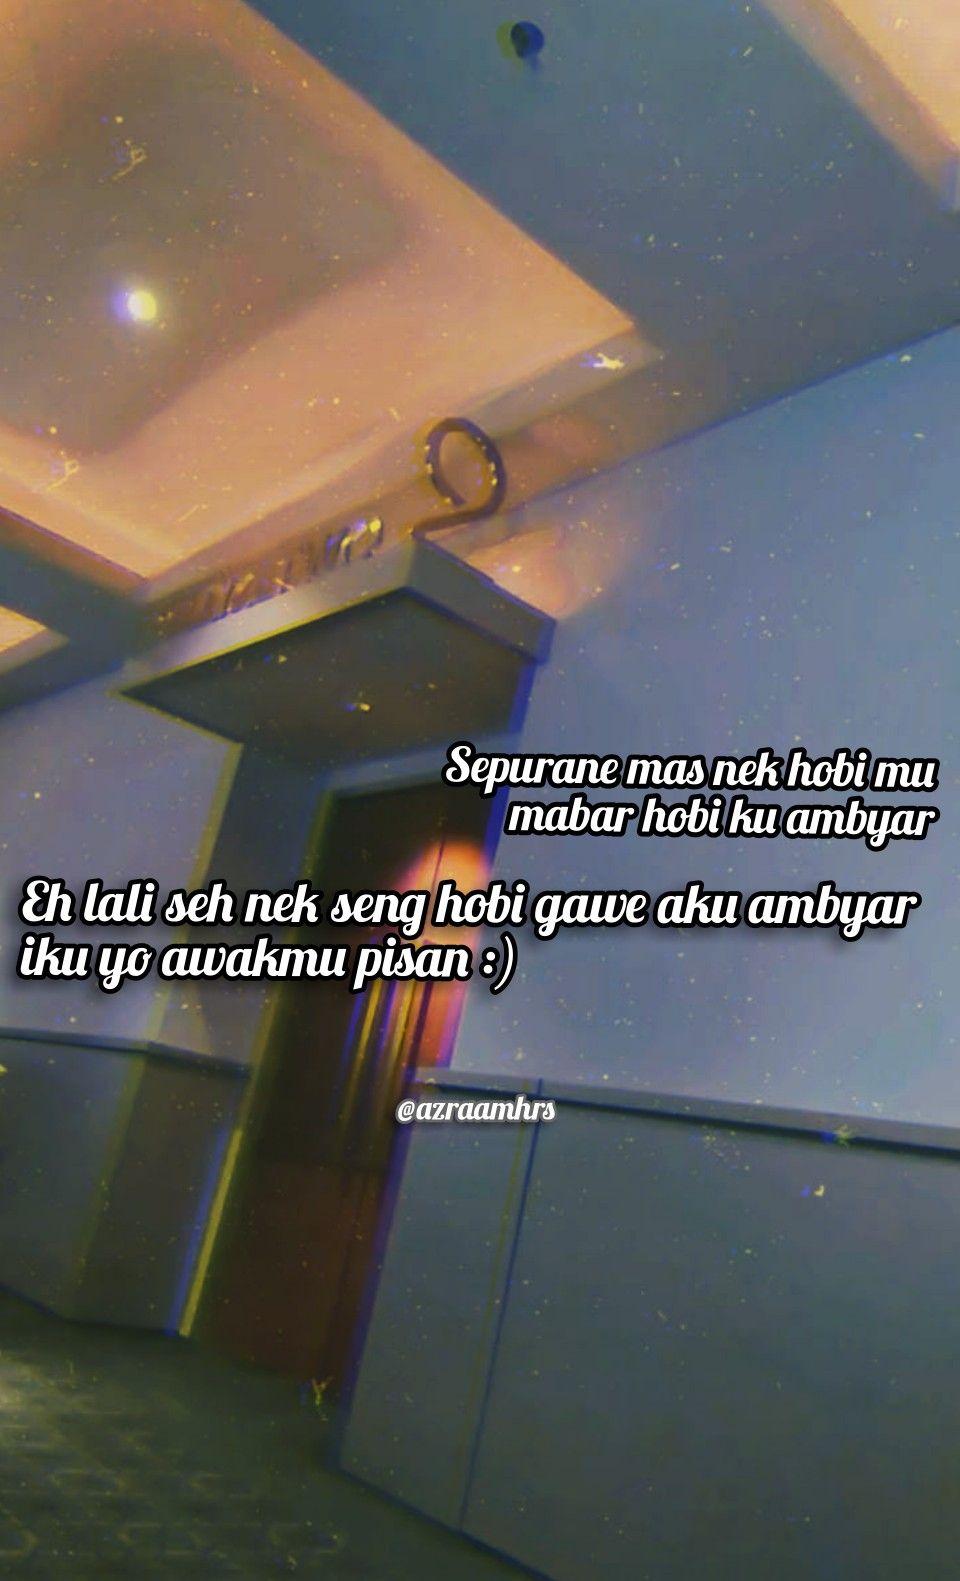 Quotes Kutipaninspirasi Ambyar Bucin Sobatambyar Kutipan